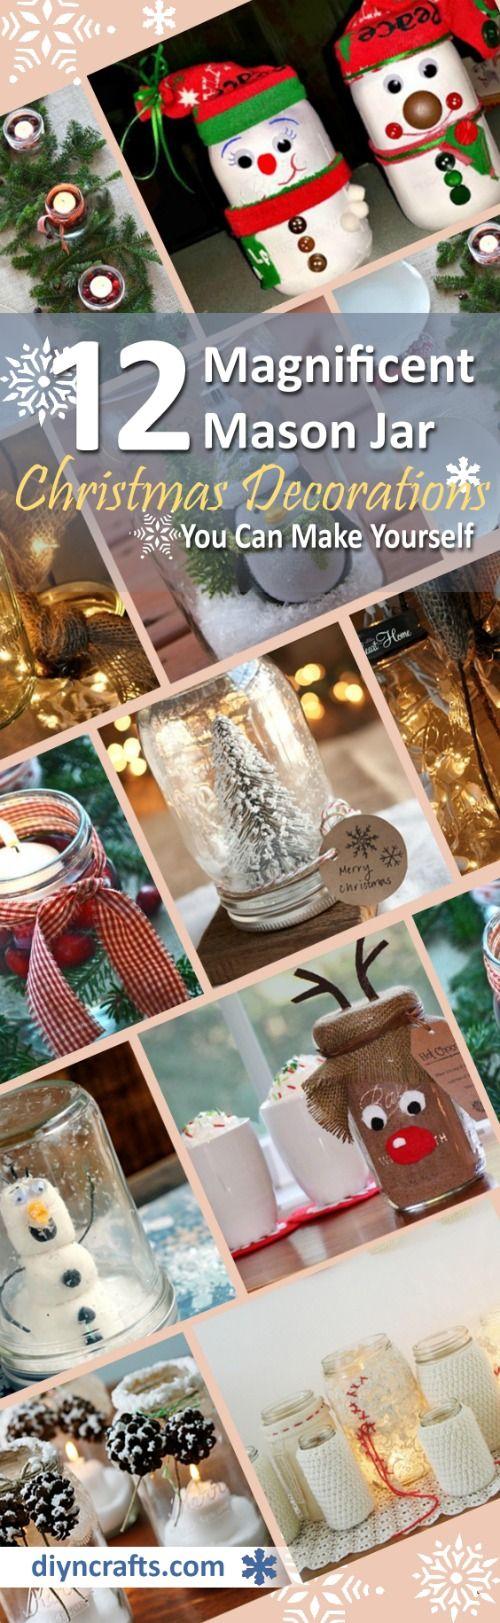 Christmas decorations you can make yourself - 12 Magnificent Mason Jar Christmas Decorations You Can Make Yourself Via Vanessacrafting